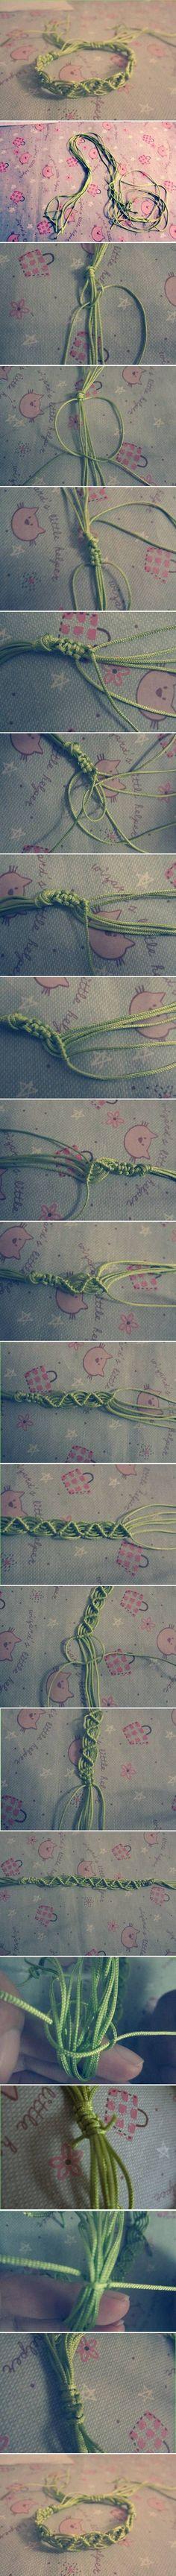 DIY Nice Weave Bracelet DIY Projects / UsefulDIY.com